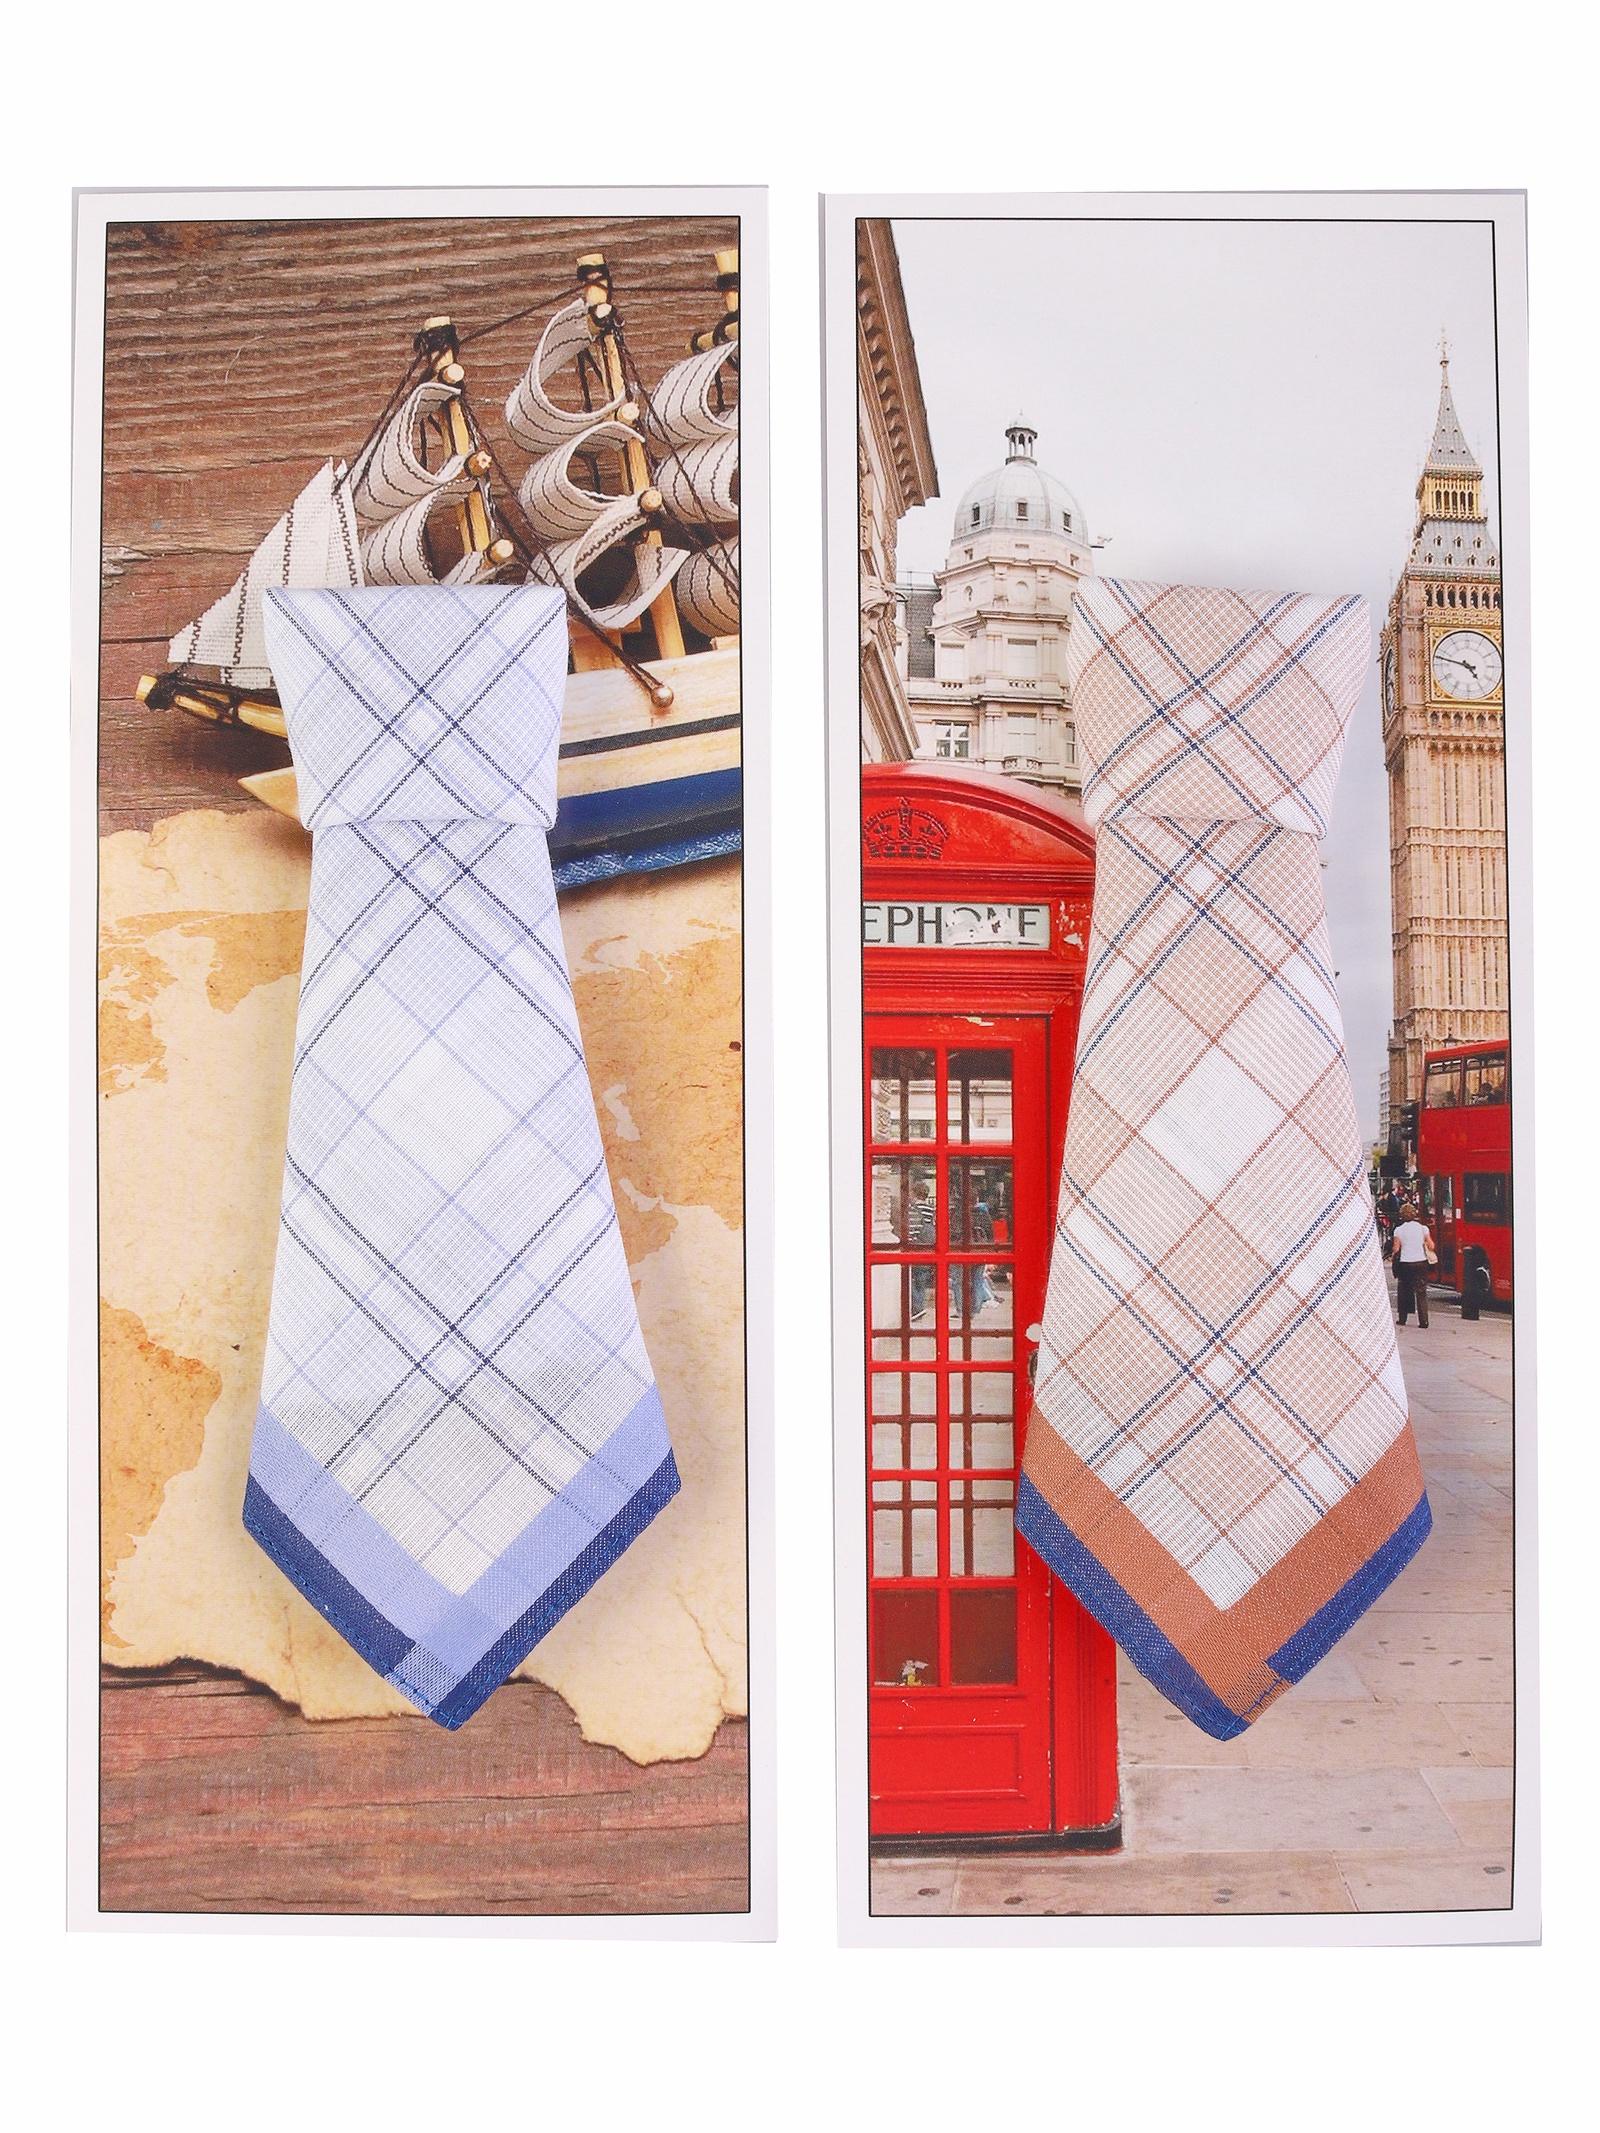 Носовой платок Etteggy ЭТ-SP430L-1x2, голубой, оранжевый, темно-синий, голубой, темно-синий, оранжевый брюки мужские oodji цвет темно синий 2b200024m 47530n 7900n размер 44 52 182